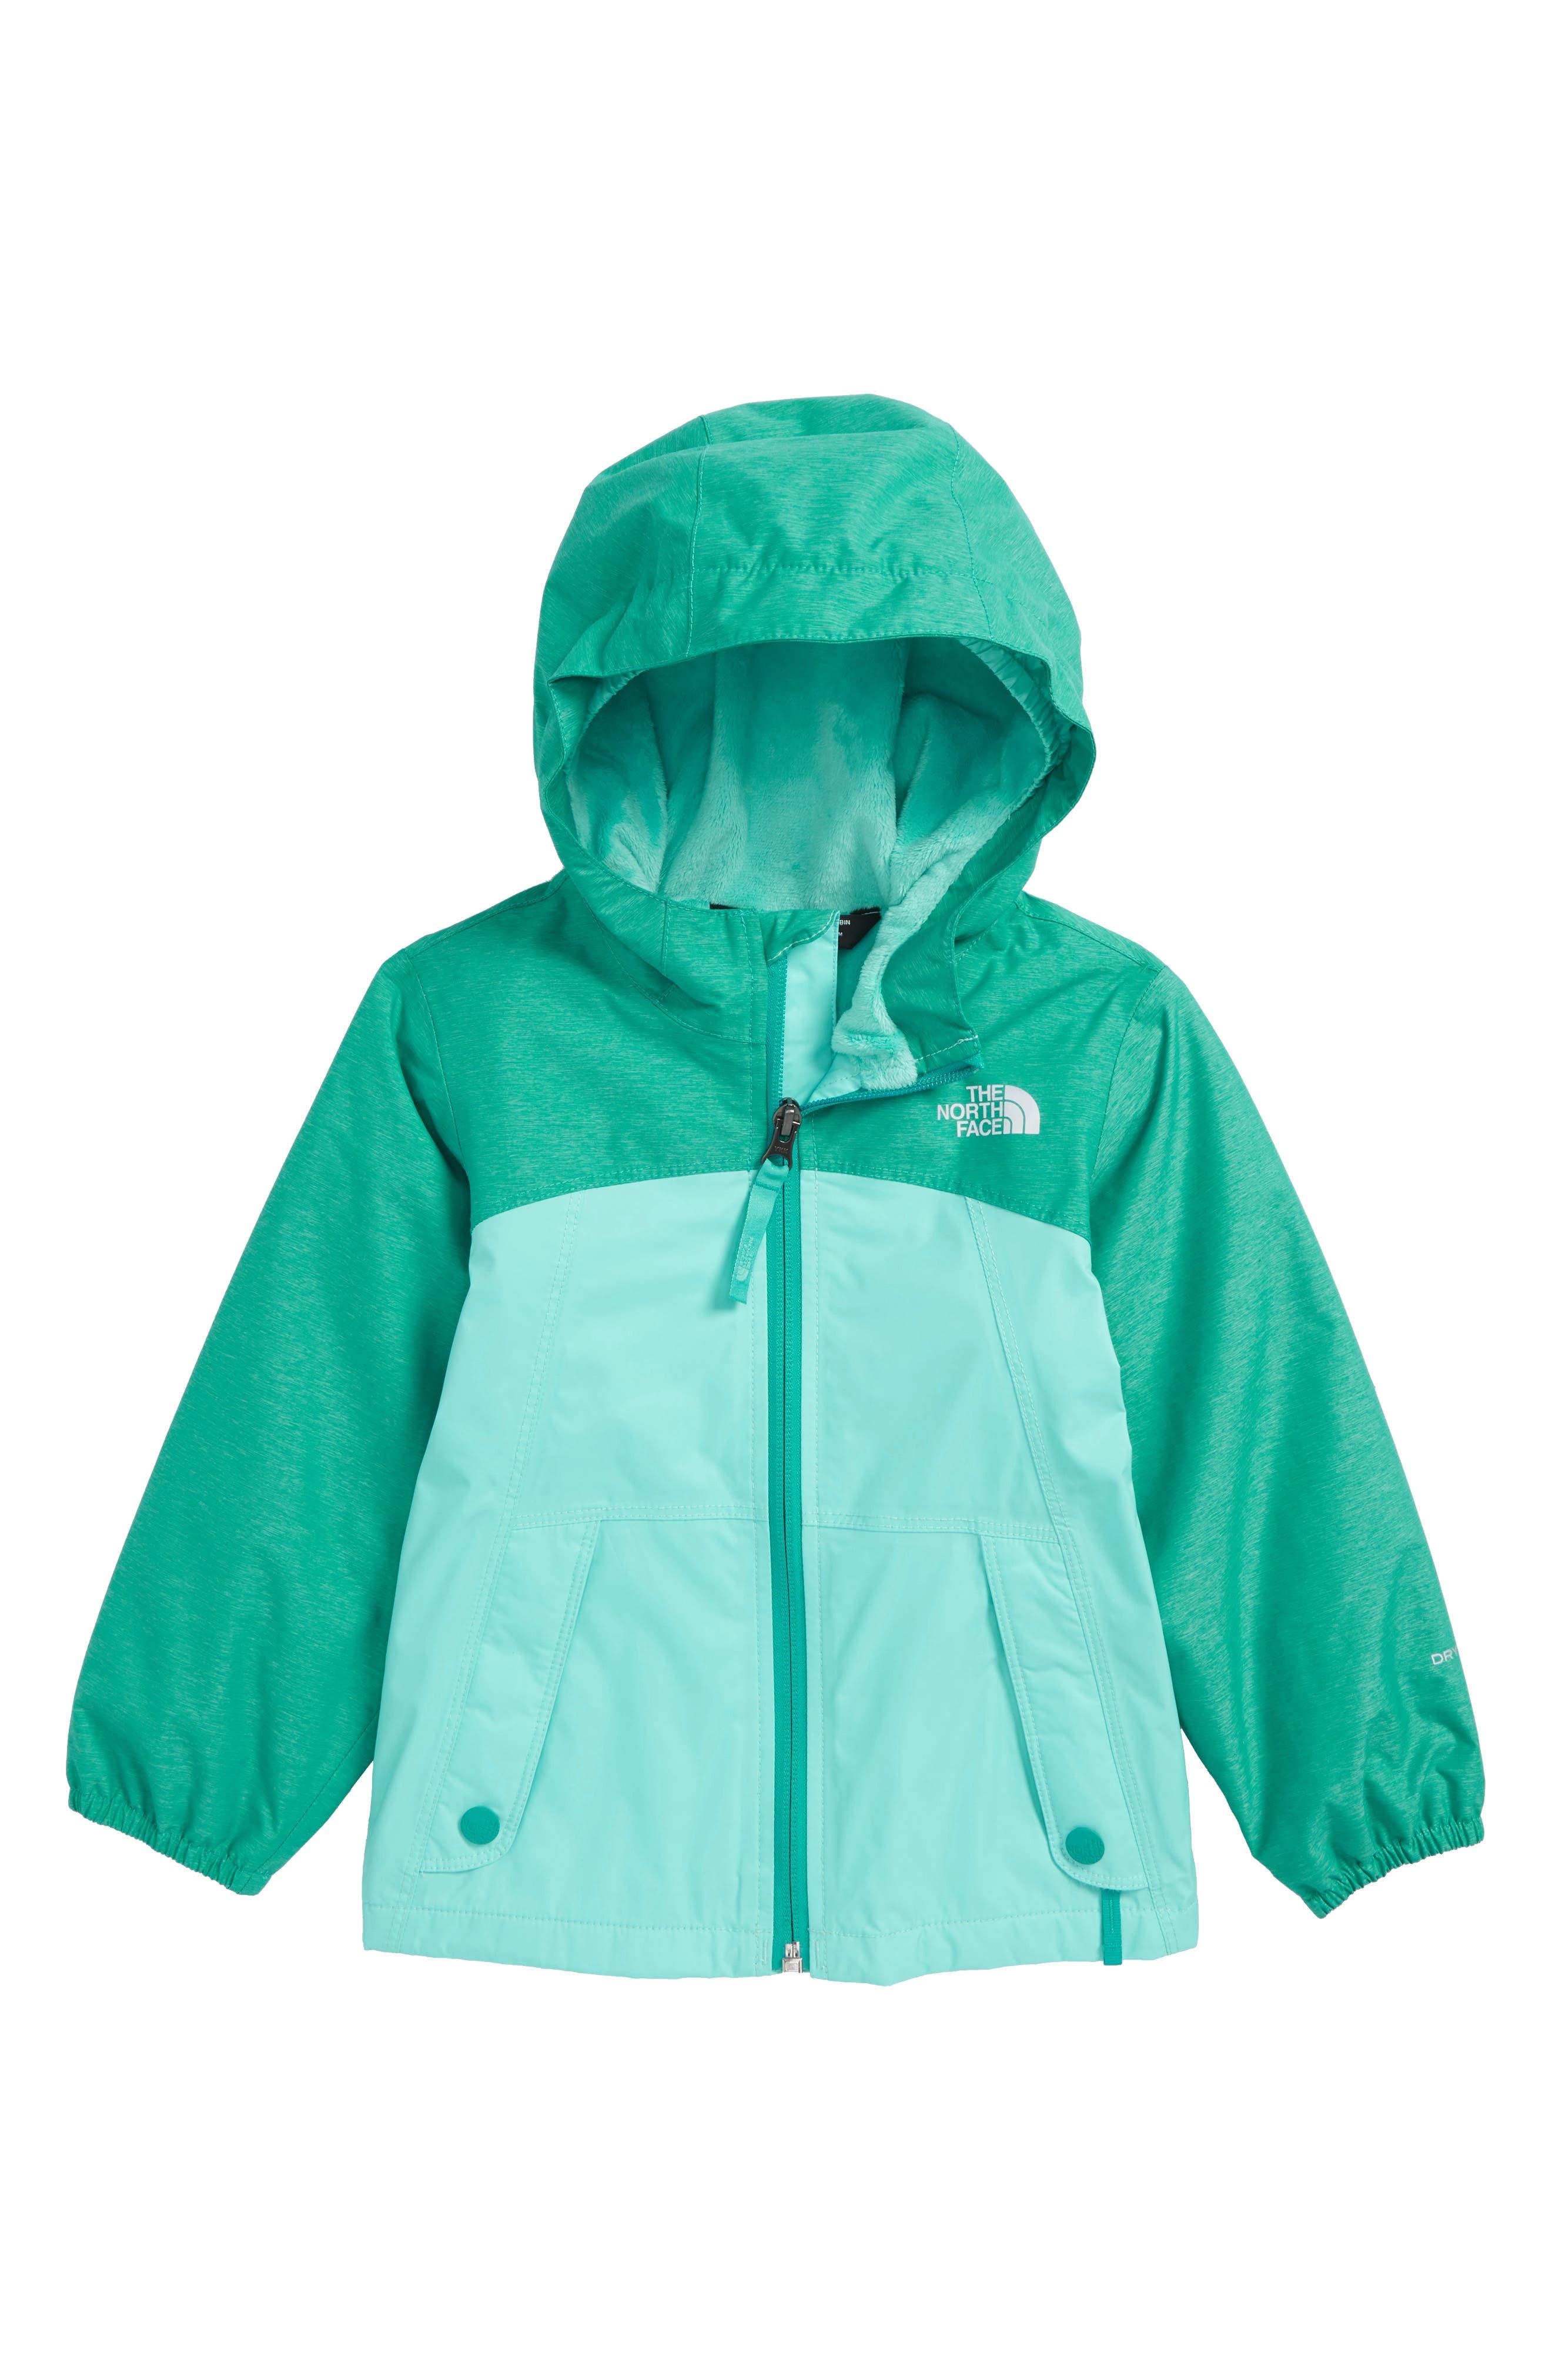 Warm Storm Jacket,                             Main thumbnail 1, color,                             KOKOMO GREEN HEATHER